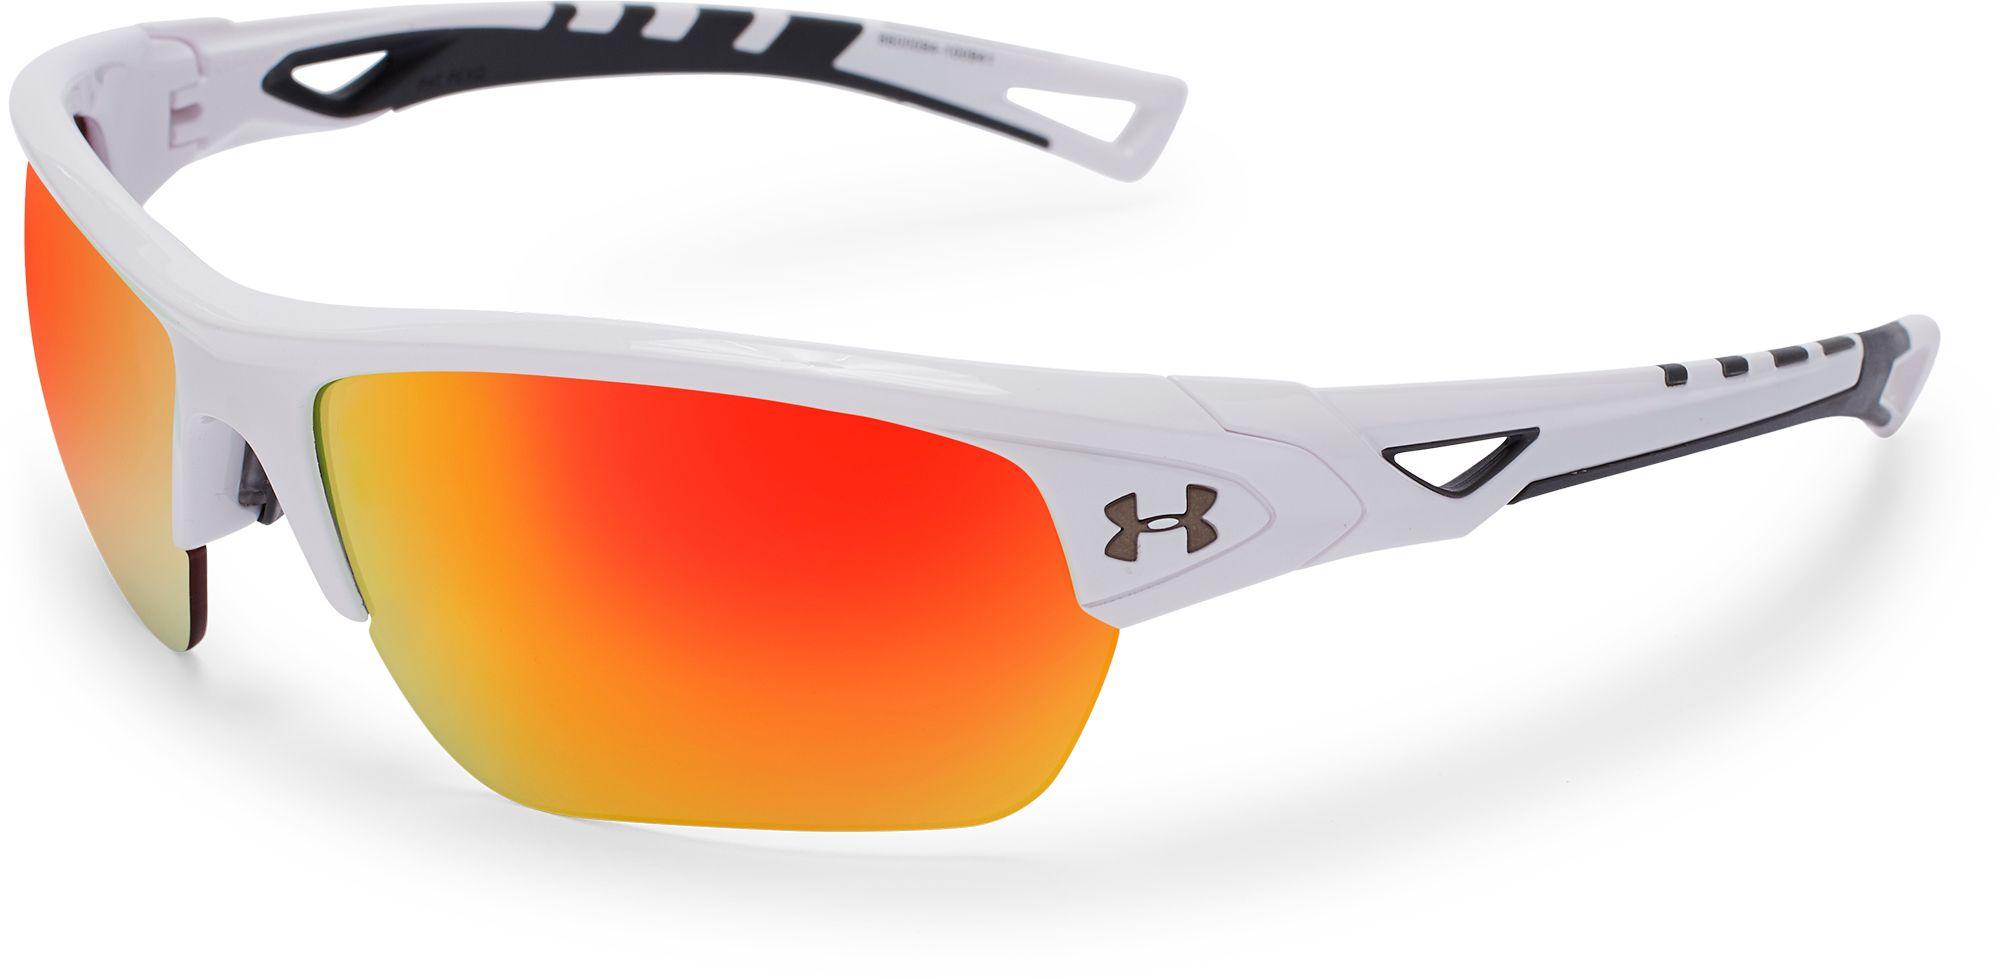 Best Sunglasses in Golf - Under Armour Octane